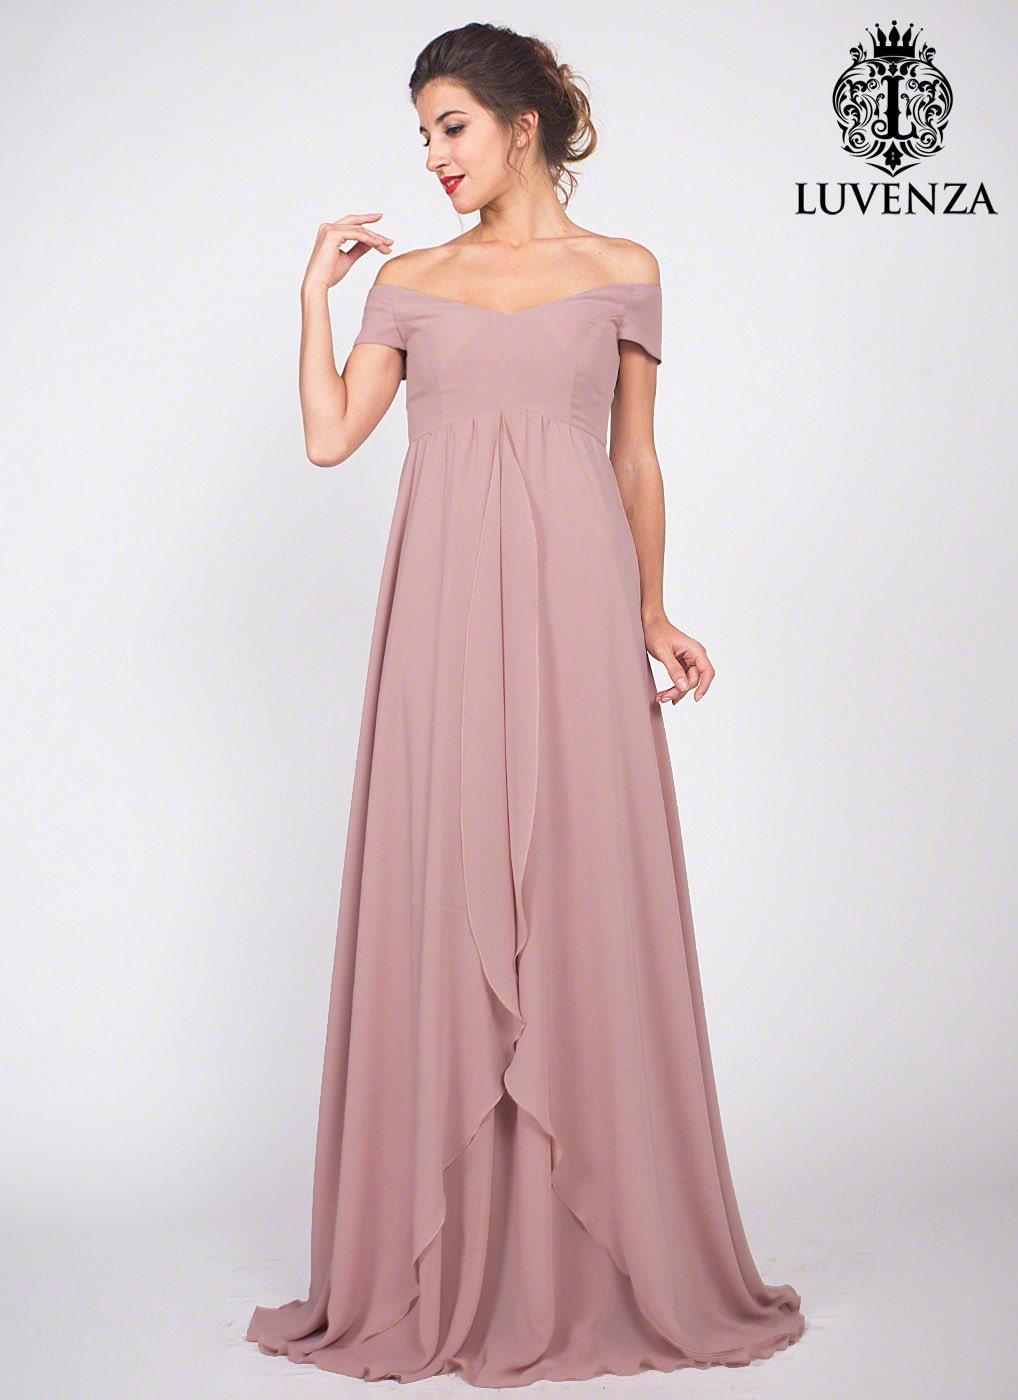 Dusty Rose Pink Chiffon Maxi Dress Bridesmaid Dress Off